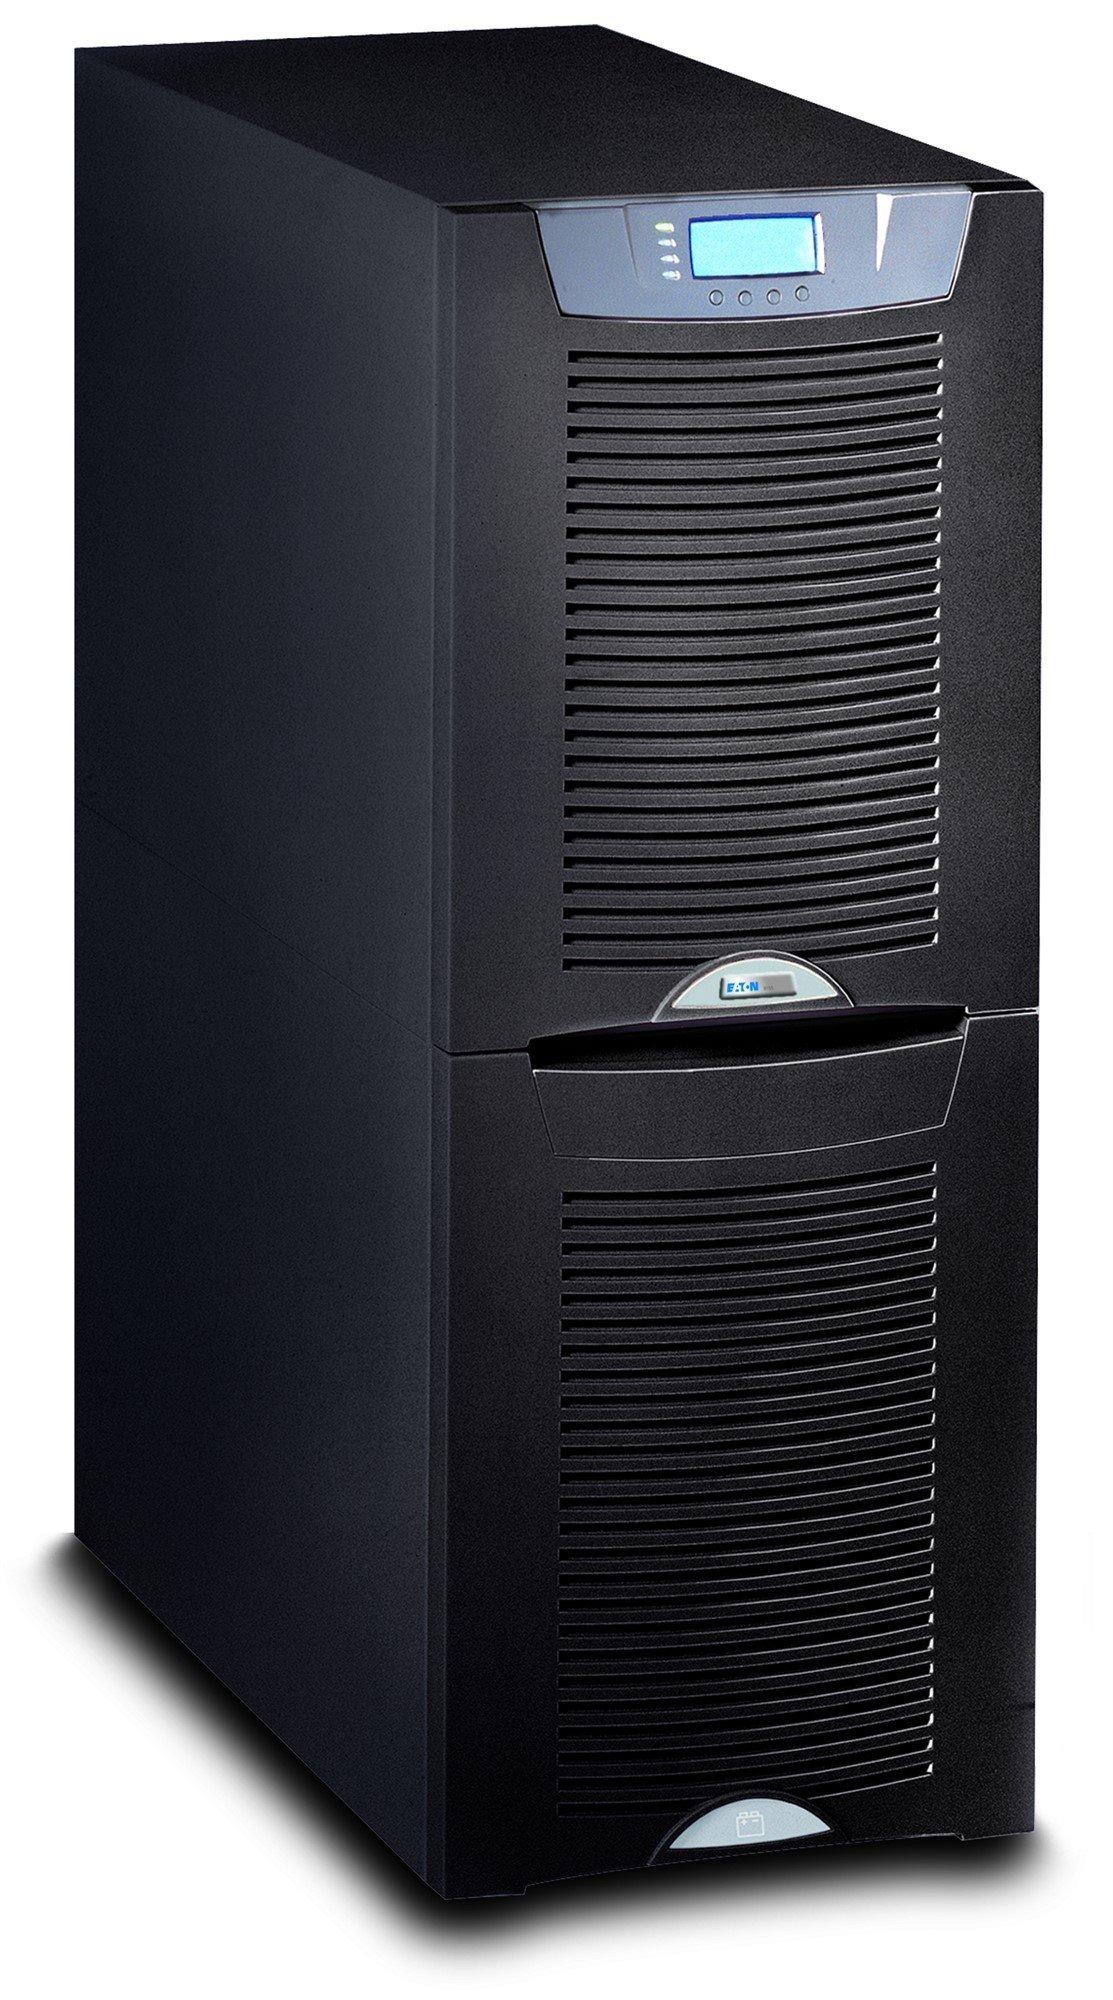 An image of Eaton powerware 9155-8-n-0-32x0ah-mbs 8000va tower black uninterruptible power s...